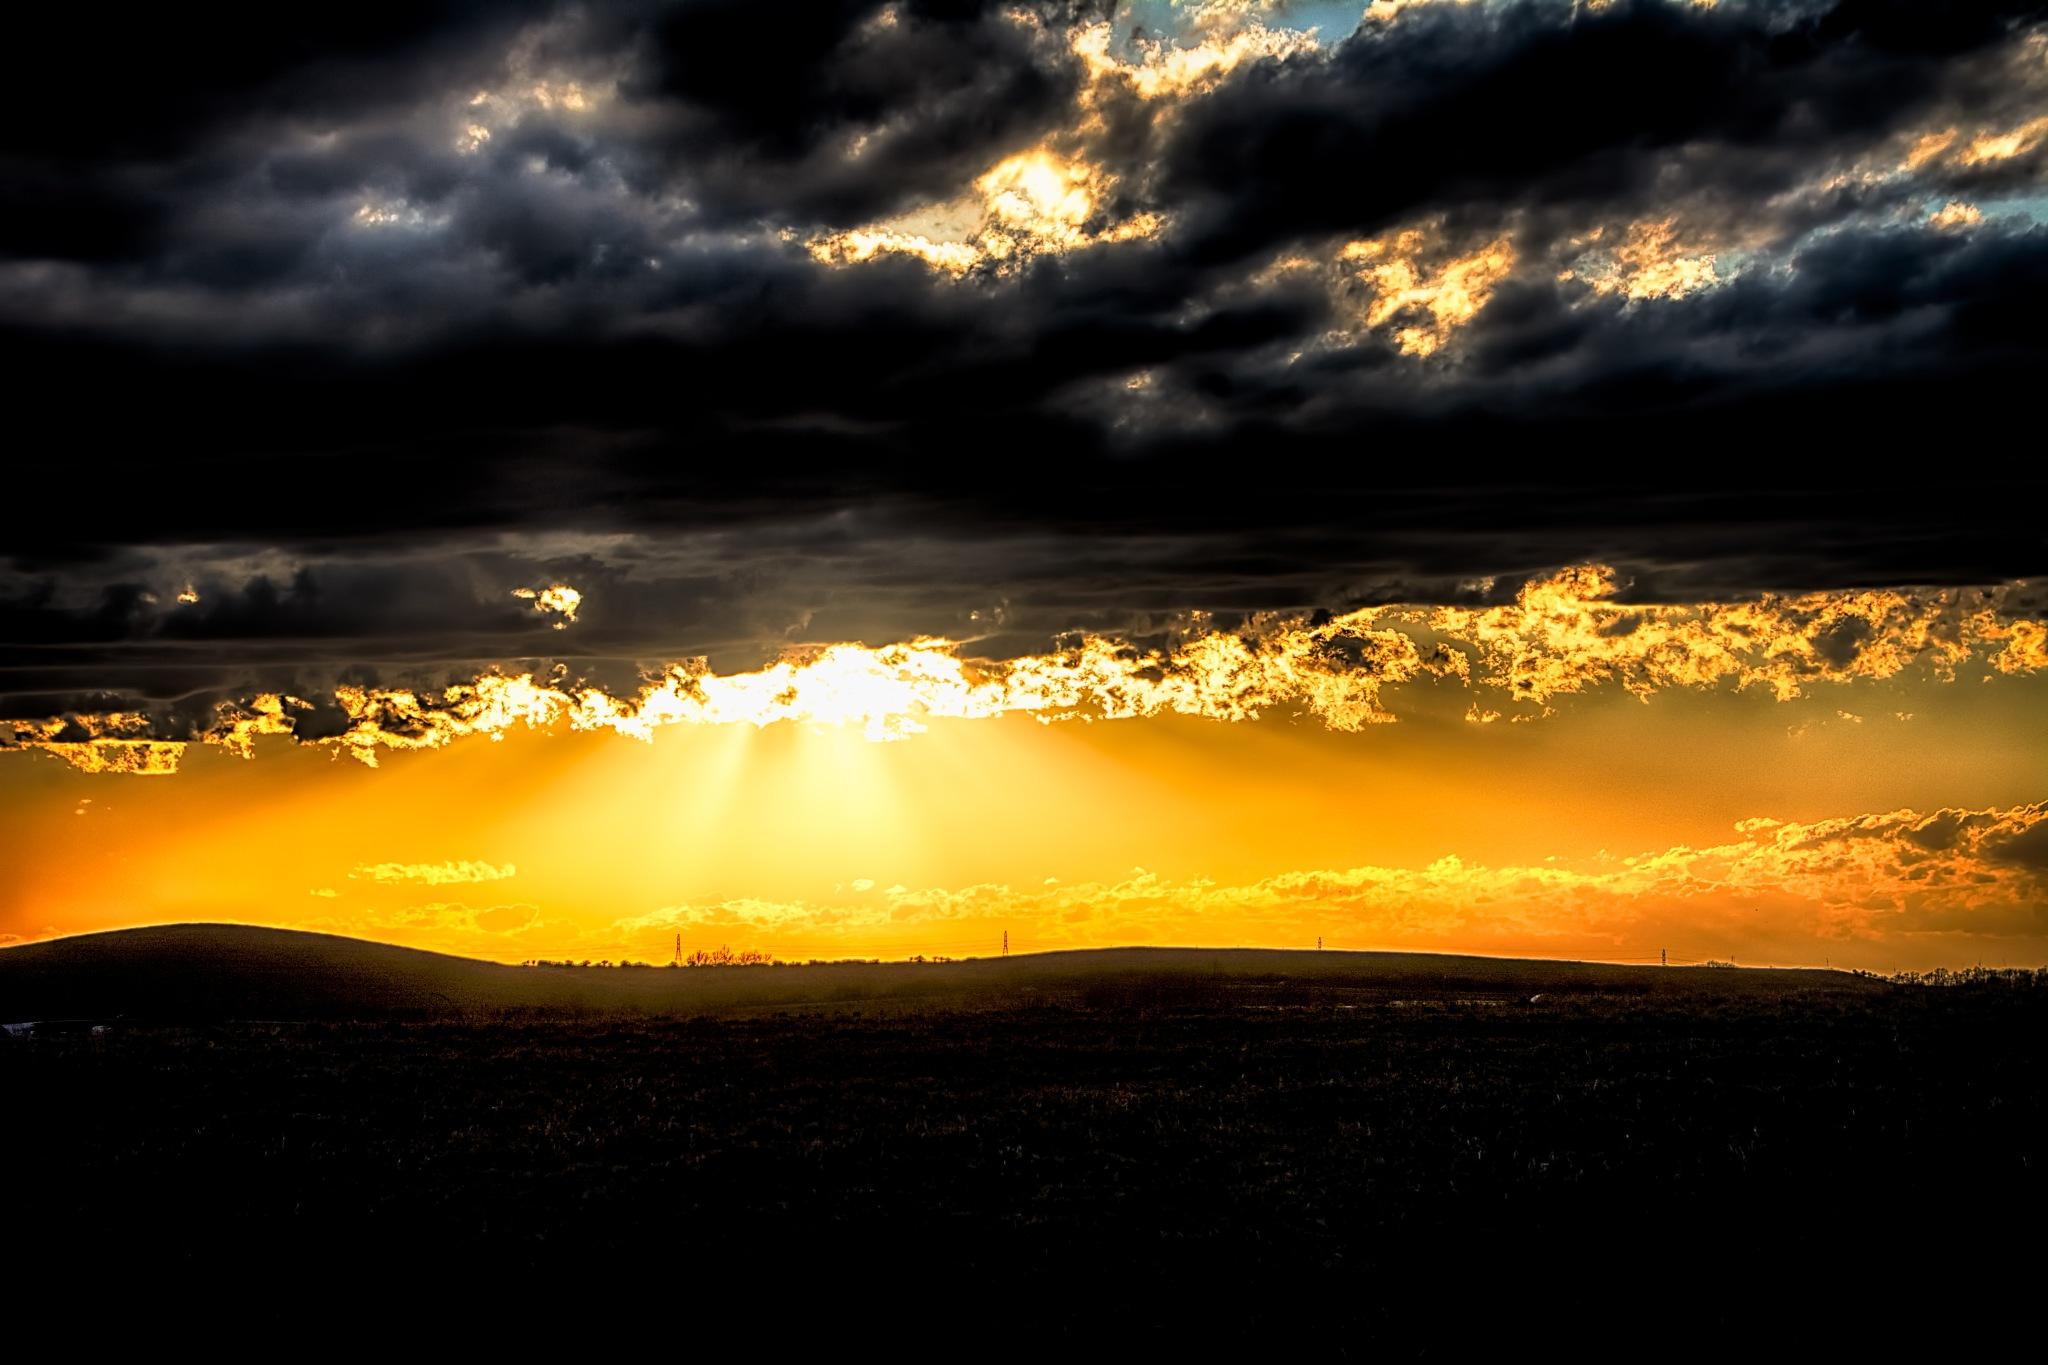 Golden Rays by 68steelphotos